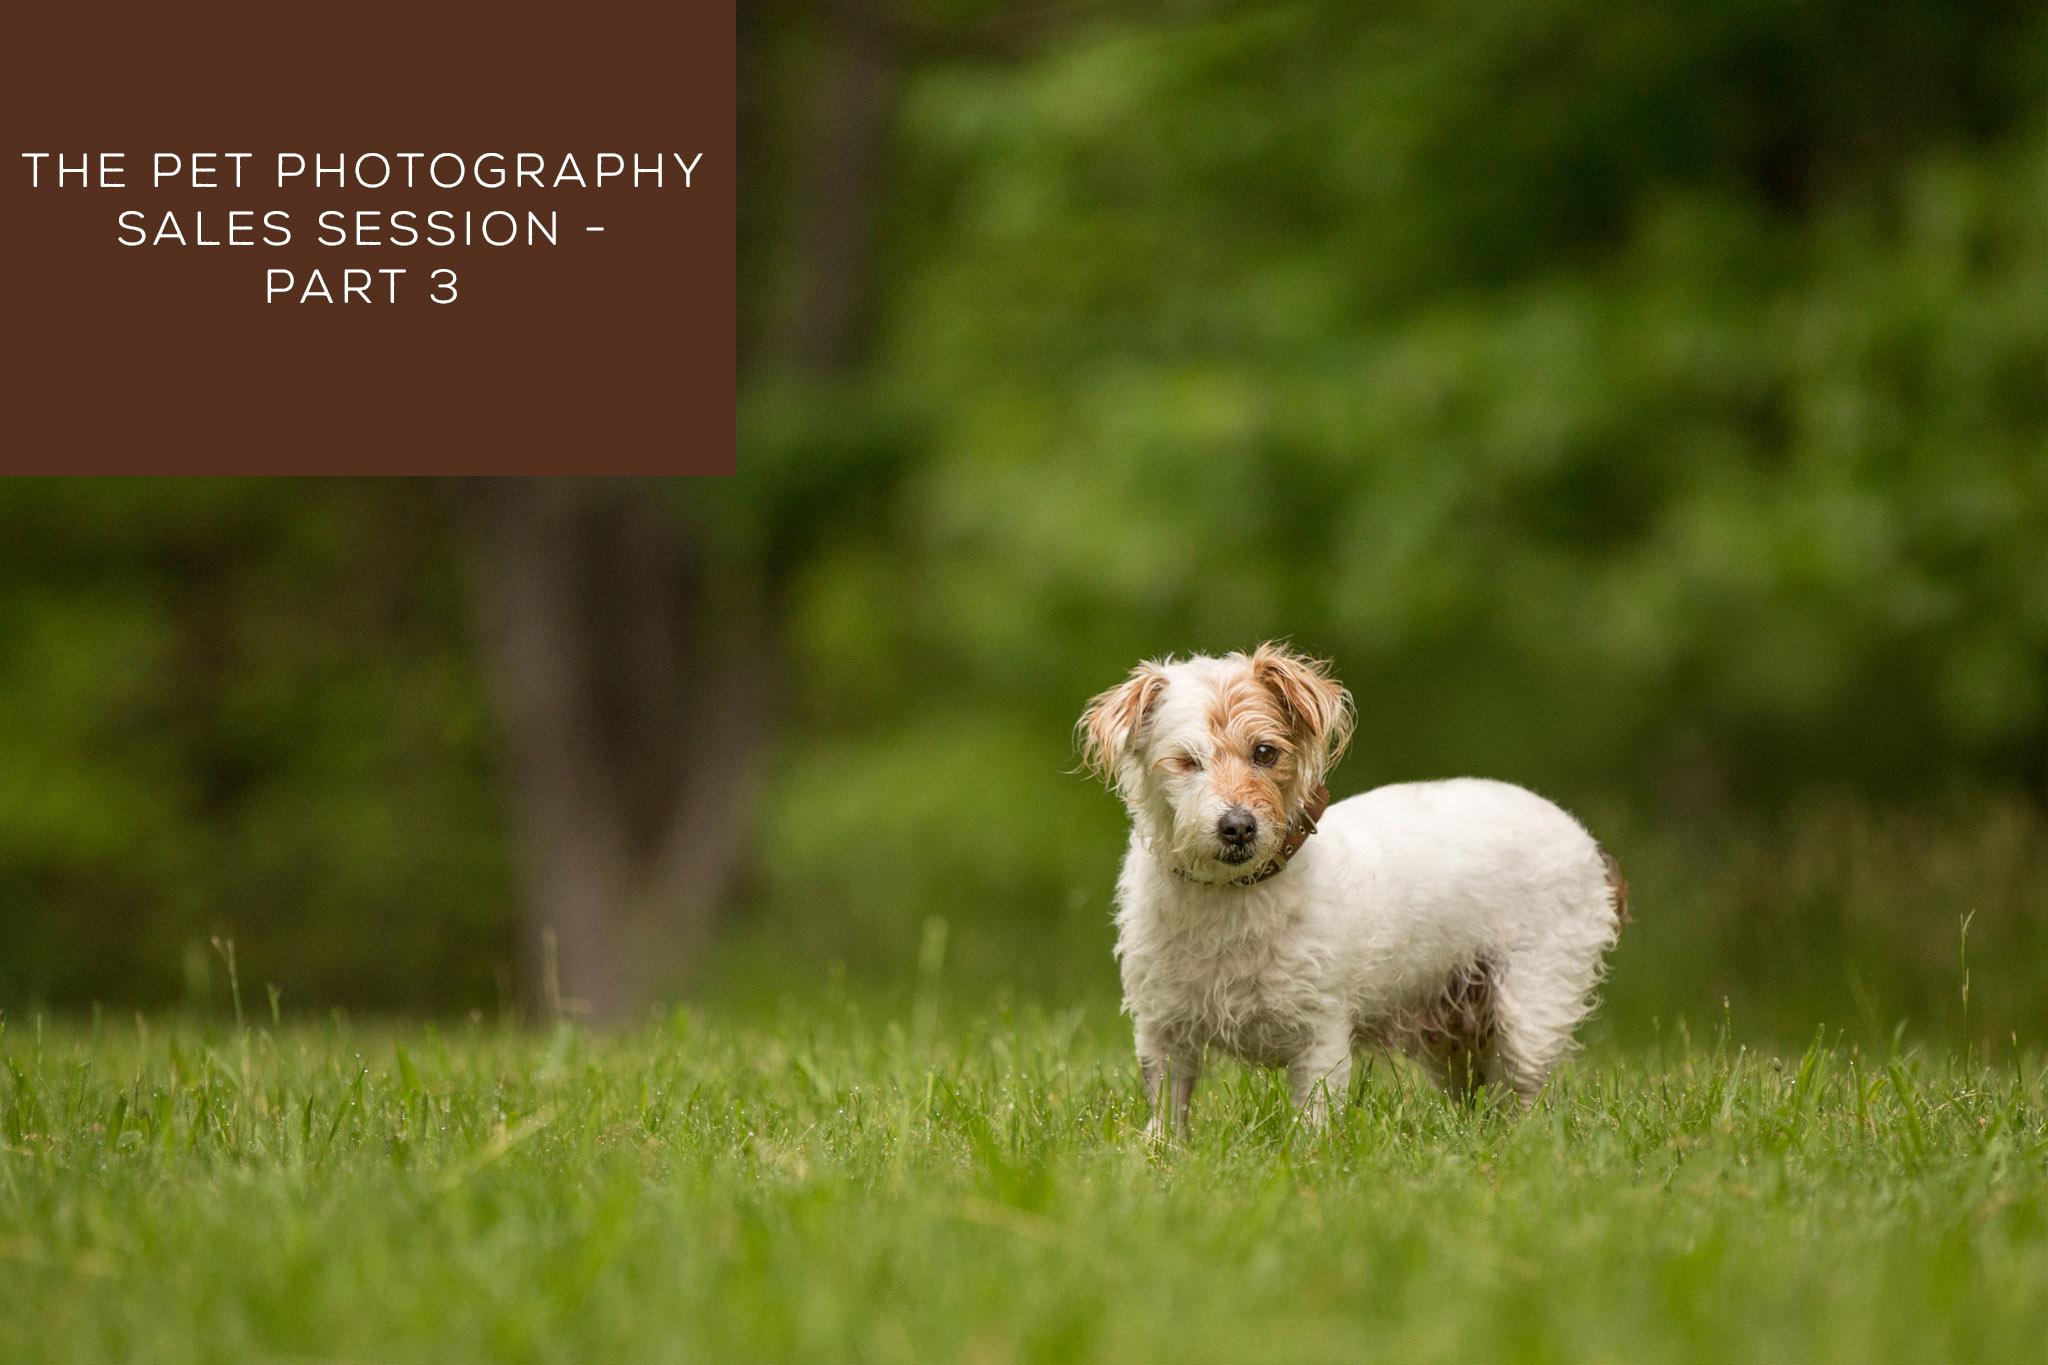 The Pet Photography Sales Session – Part 3